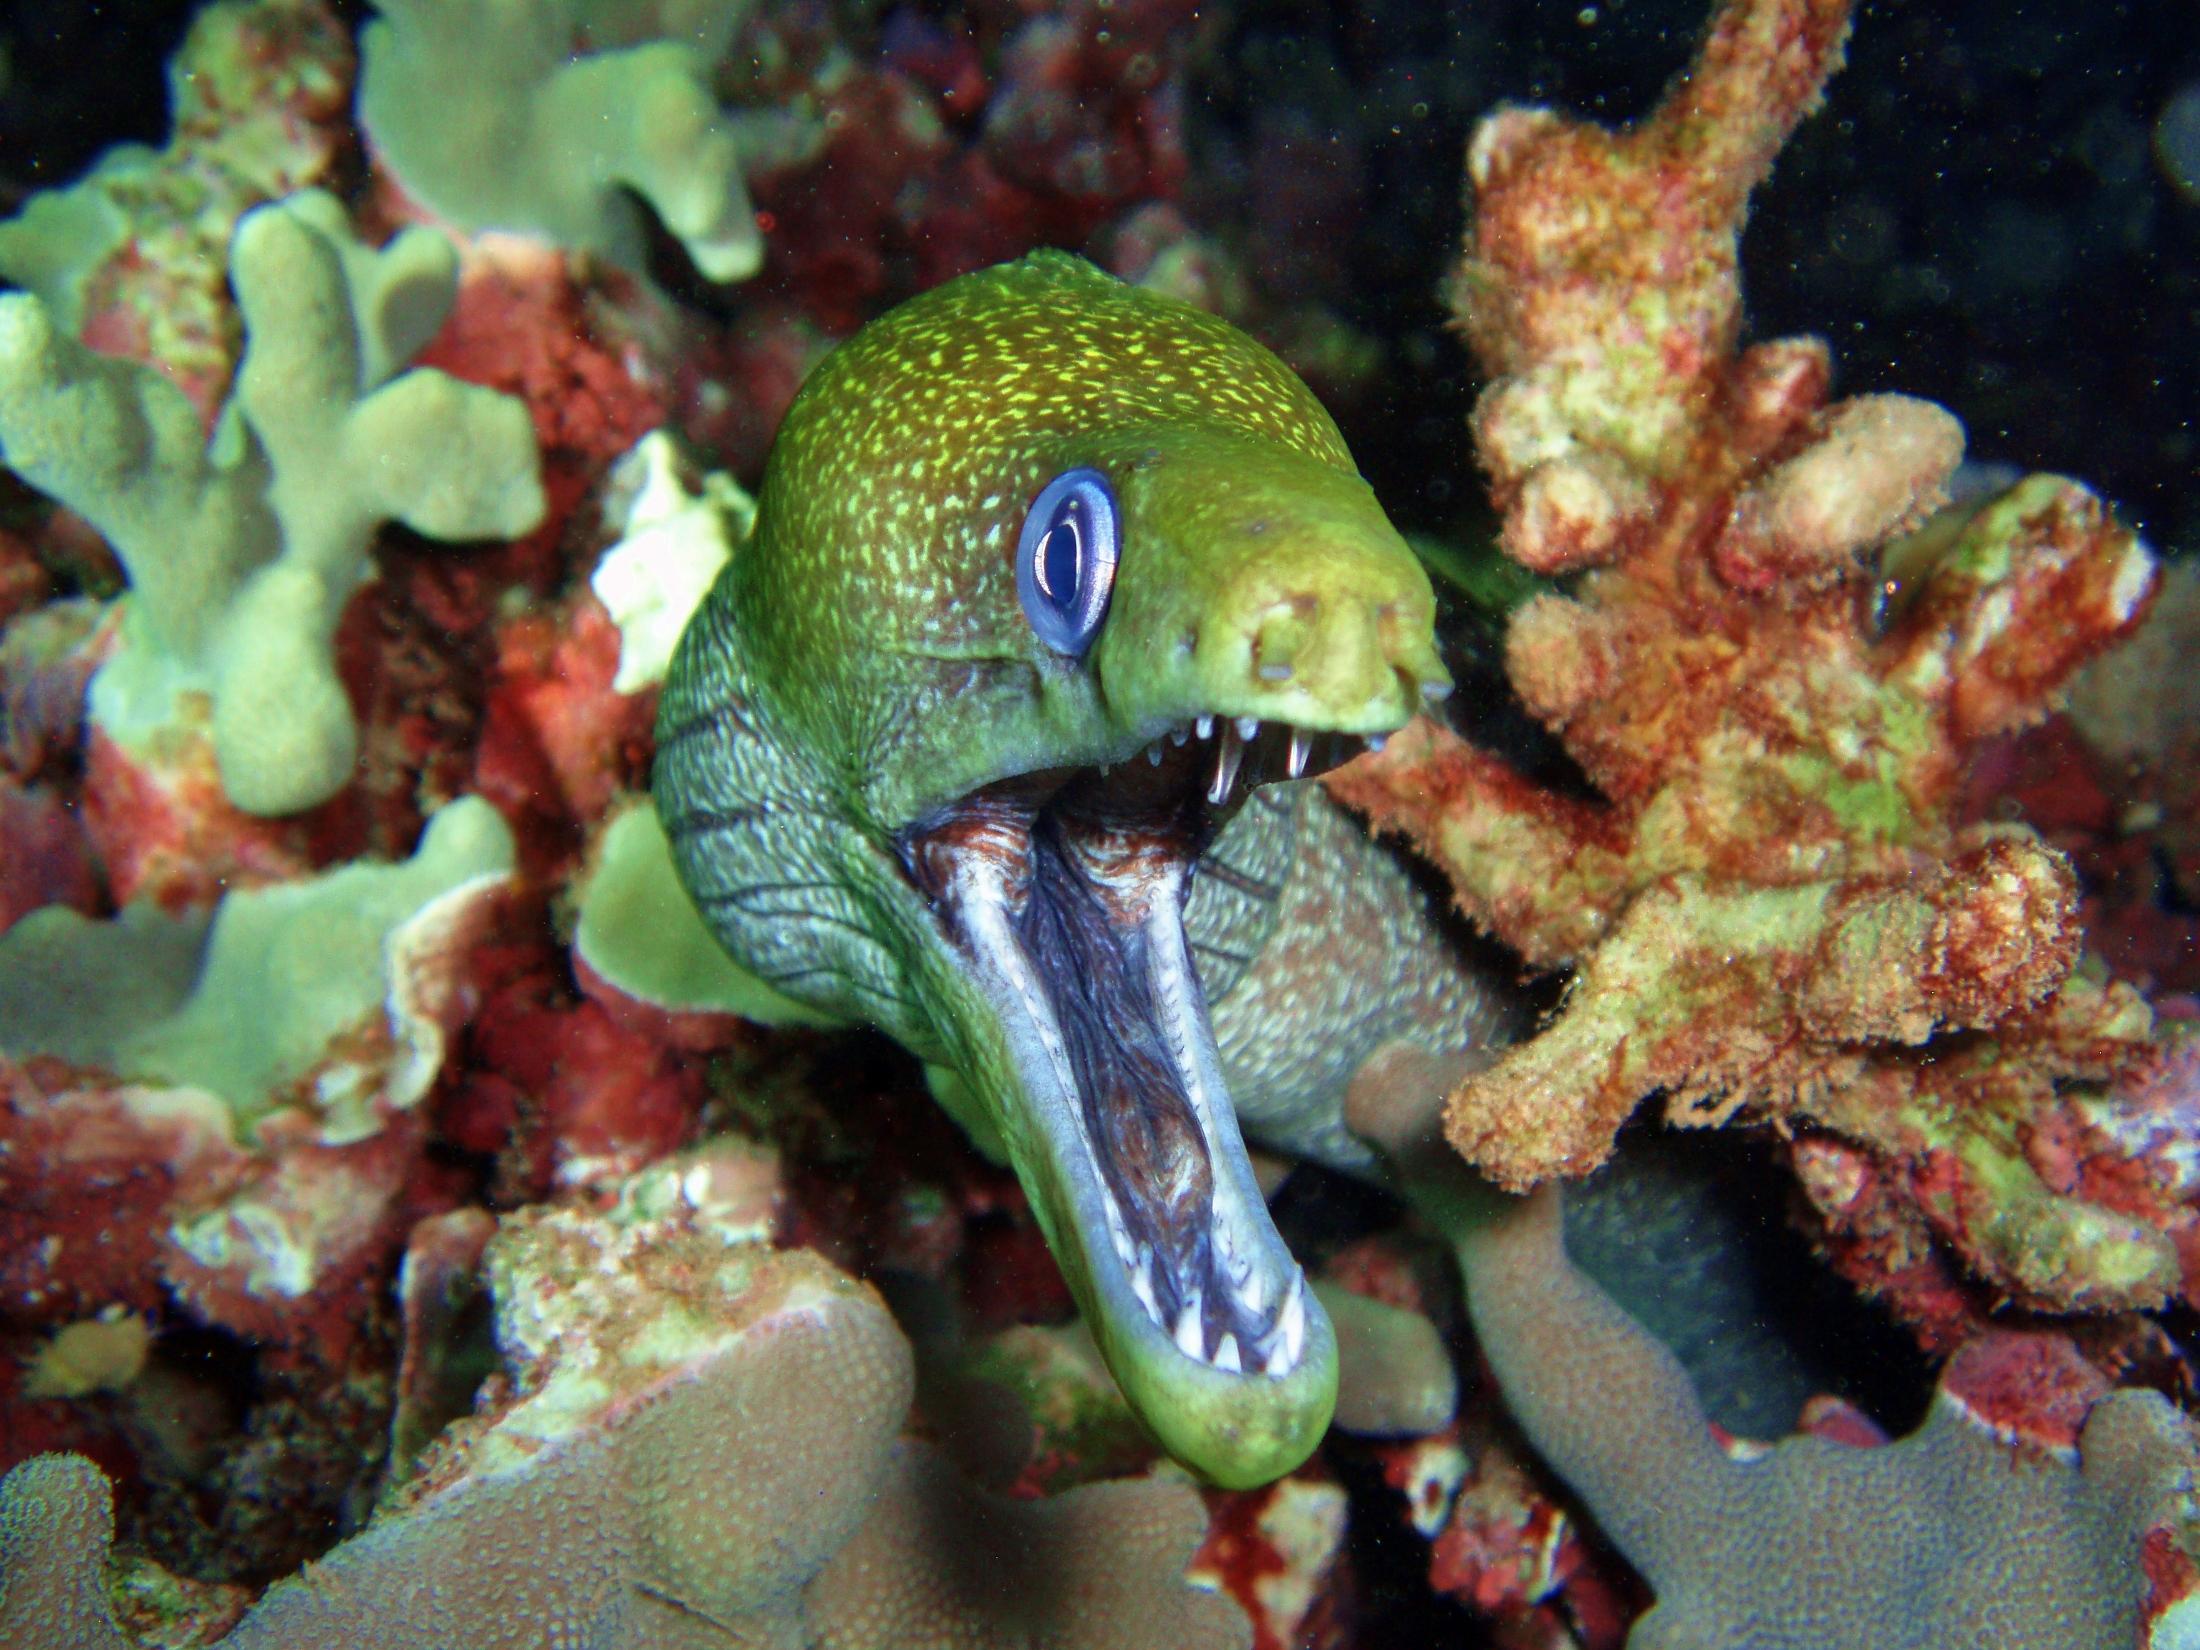 Undulate Moray Eel on a Night Dive